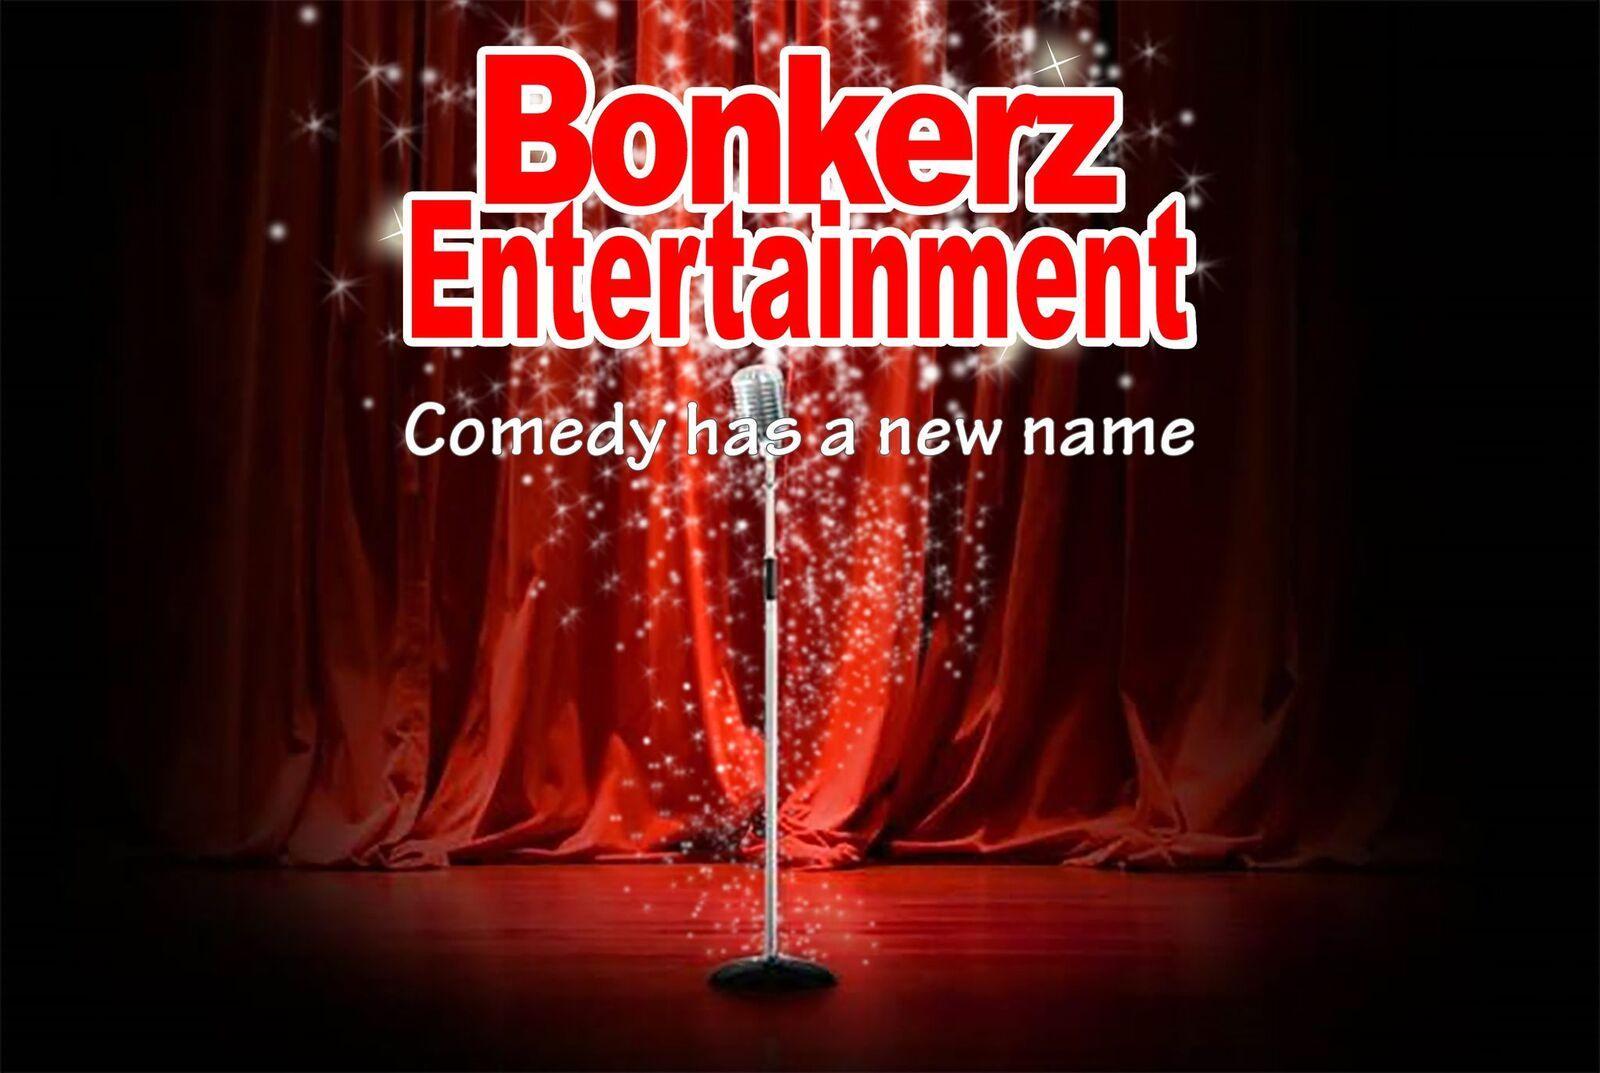 BonkerZ Comedy Clubs Australia 2 for 1 Comedy Shows